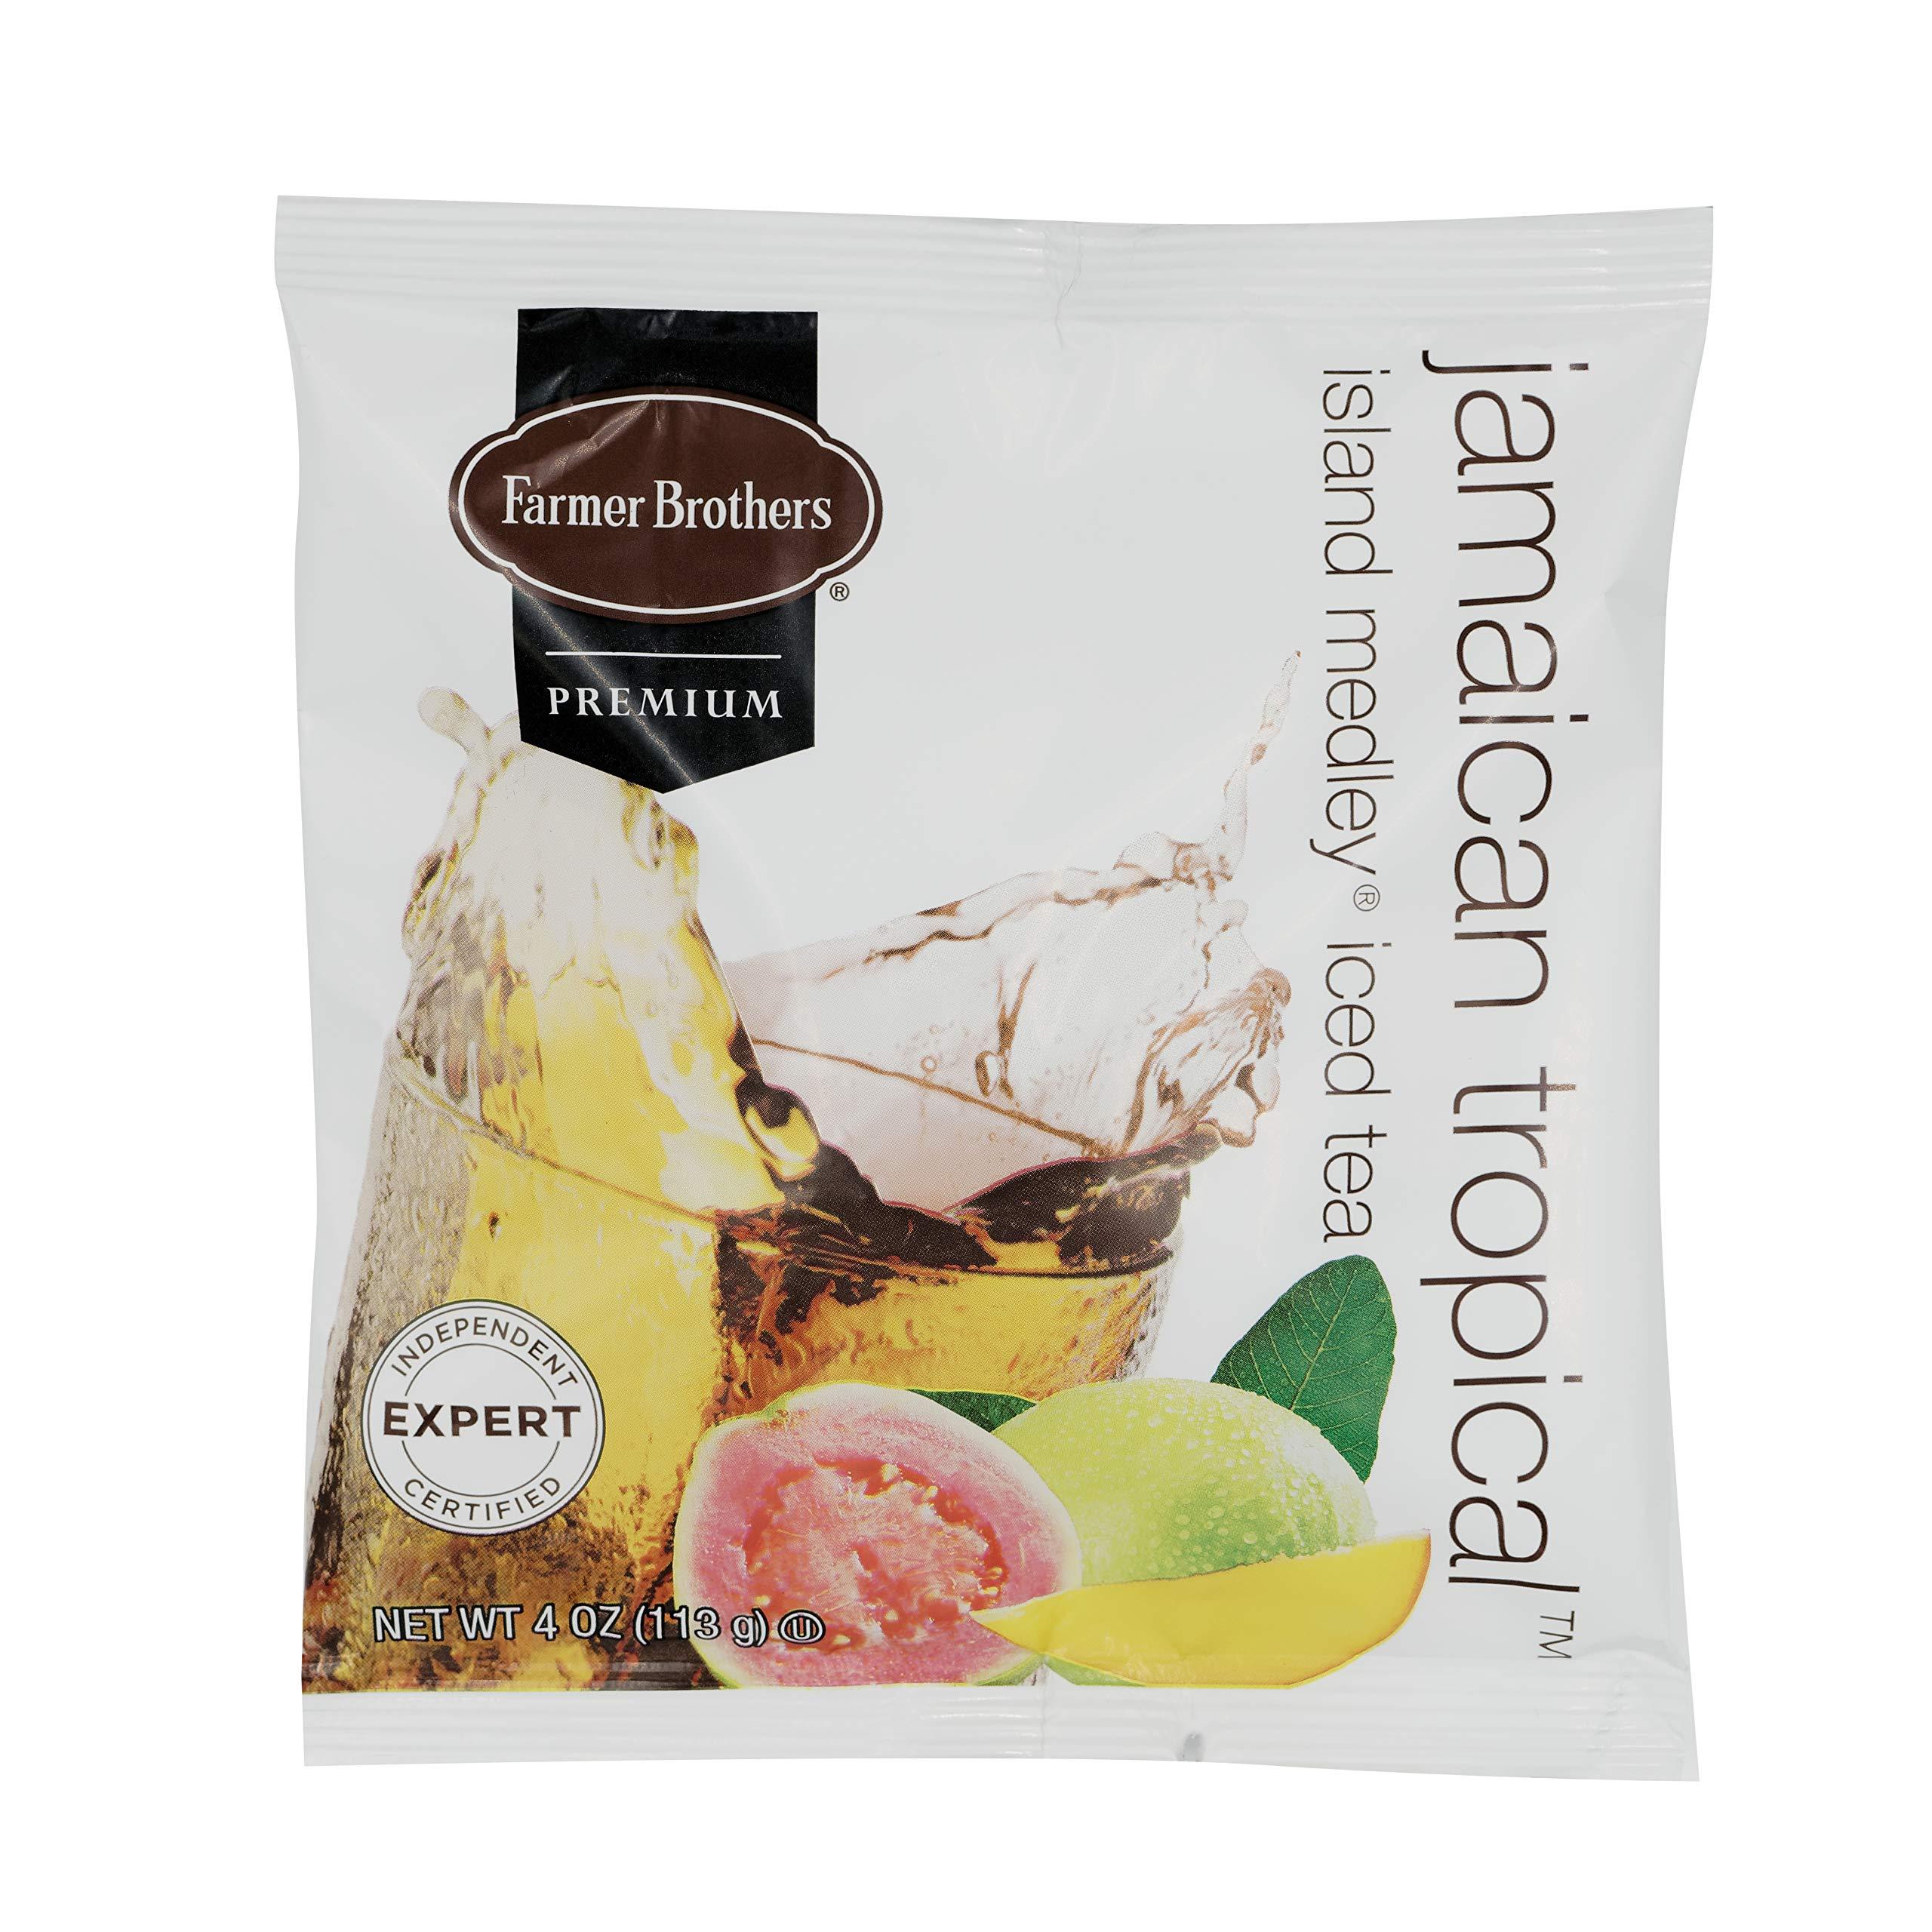 Farmer Brothers Island Medley Jamaican Tropical Iced Tea (24 Count) by Farmer Brothers